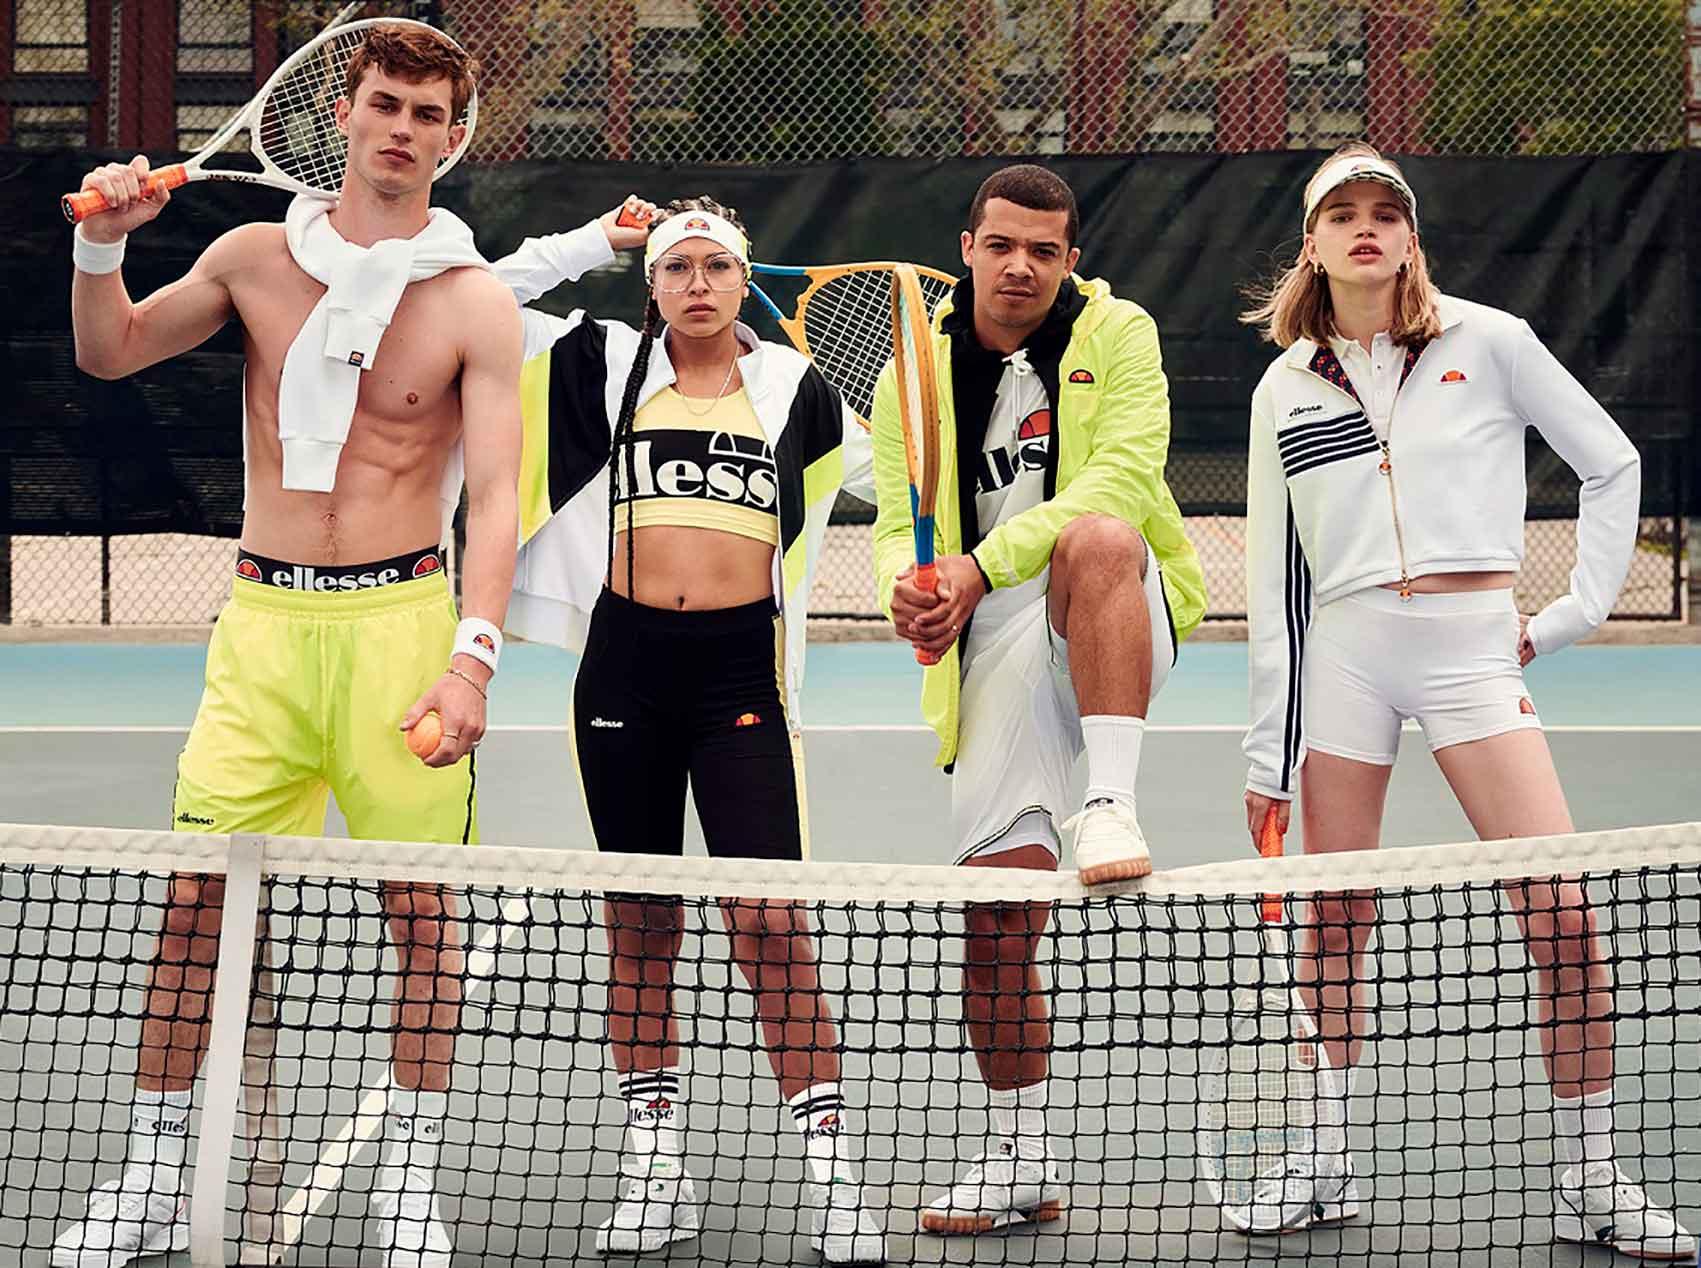 ELLESSE. מותג אופנה איטלקי משיק את קולקציית אביב קיץ 2020 ואתר רשמי בישראל